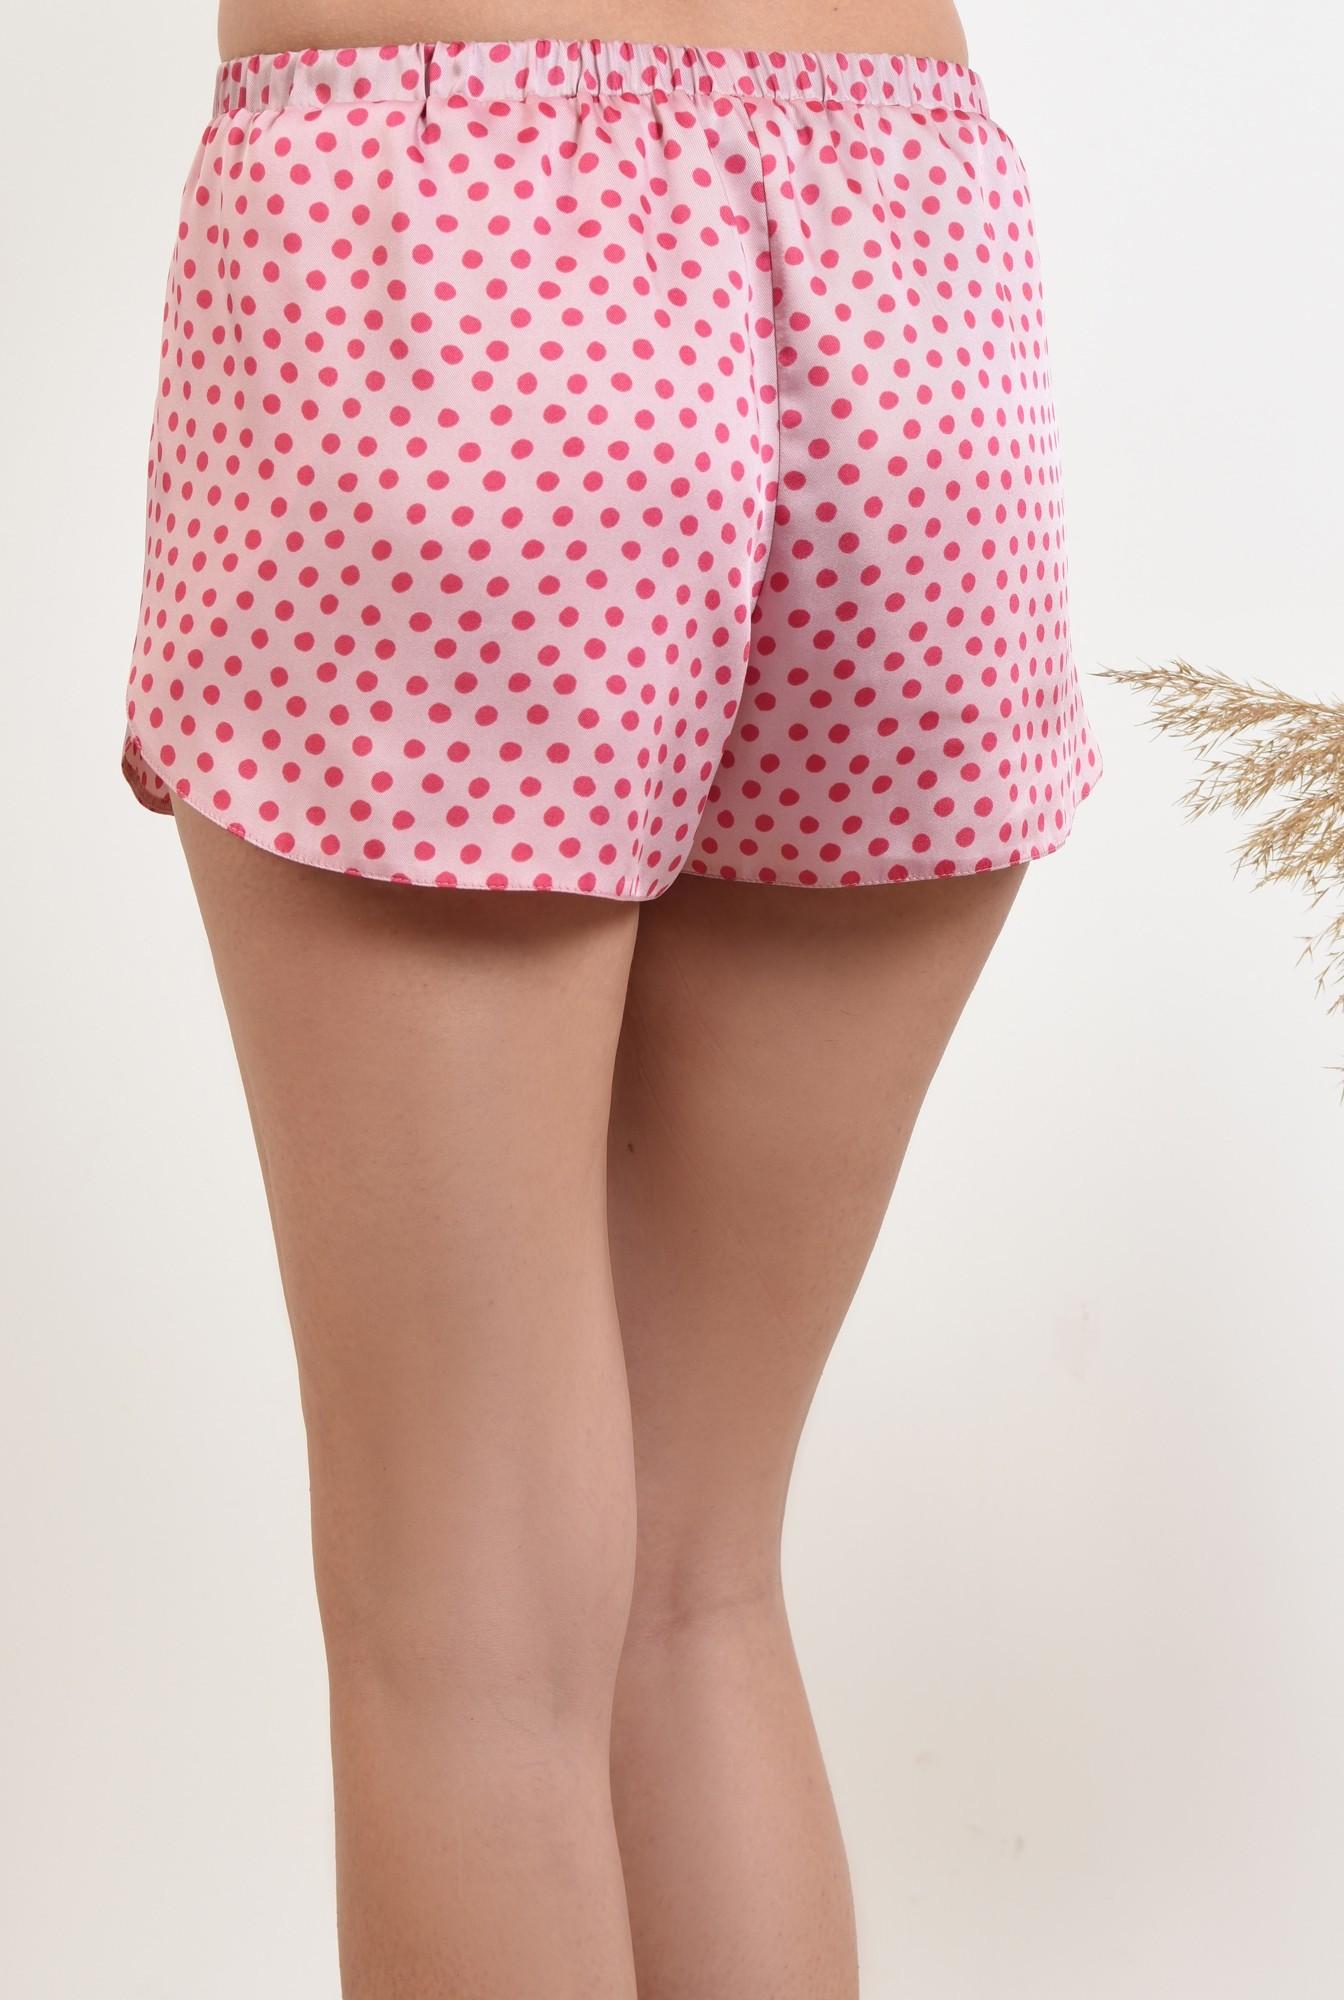 1 - 360 - sort din satin, cu imprimeu geometric, buline roz, pantaloni scurti